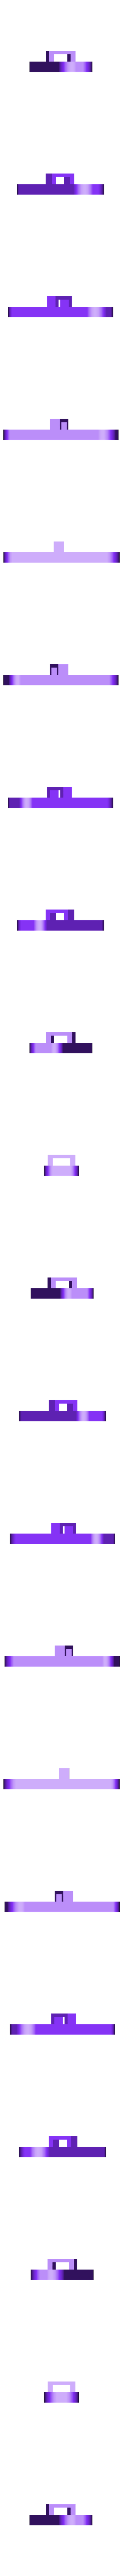 servo_tilt_arm.stl Download free STL file $5 drone camera tilter • 3D printable object, NikodemBartnik